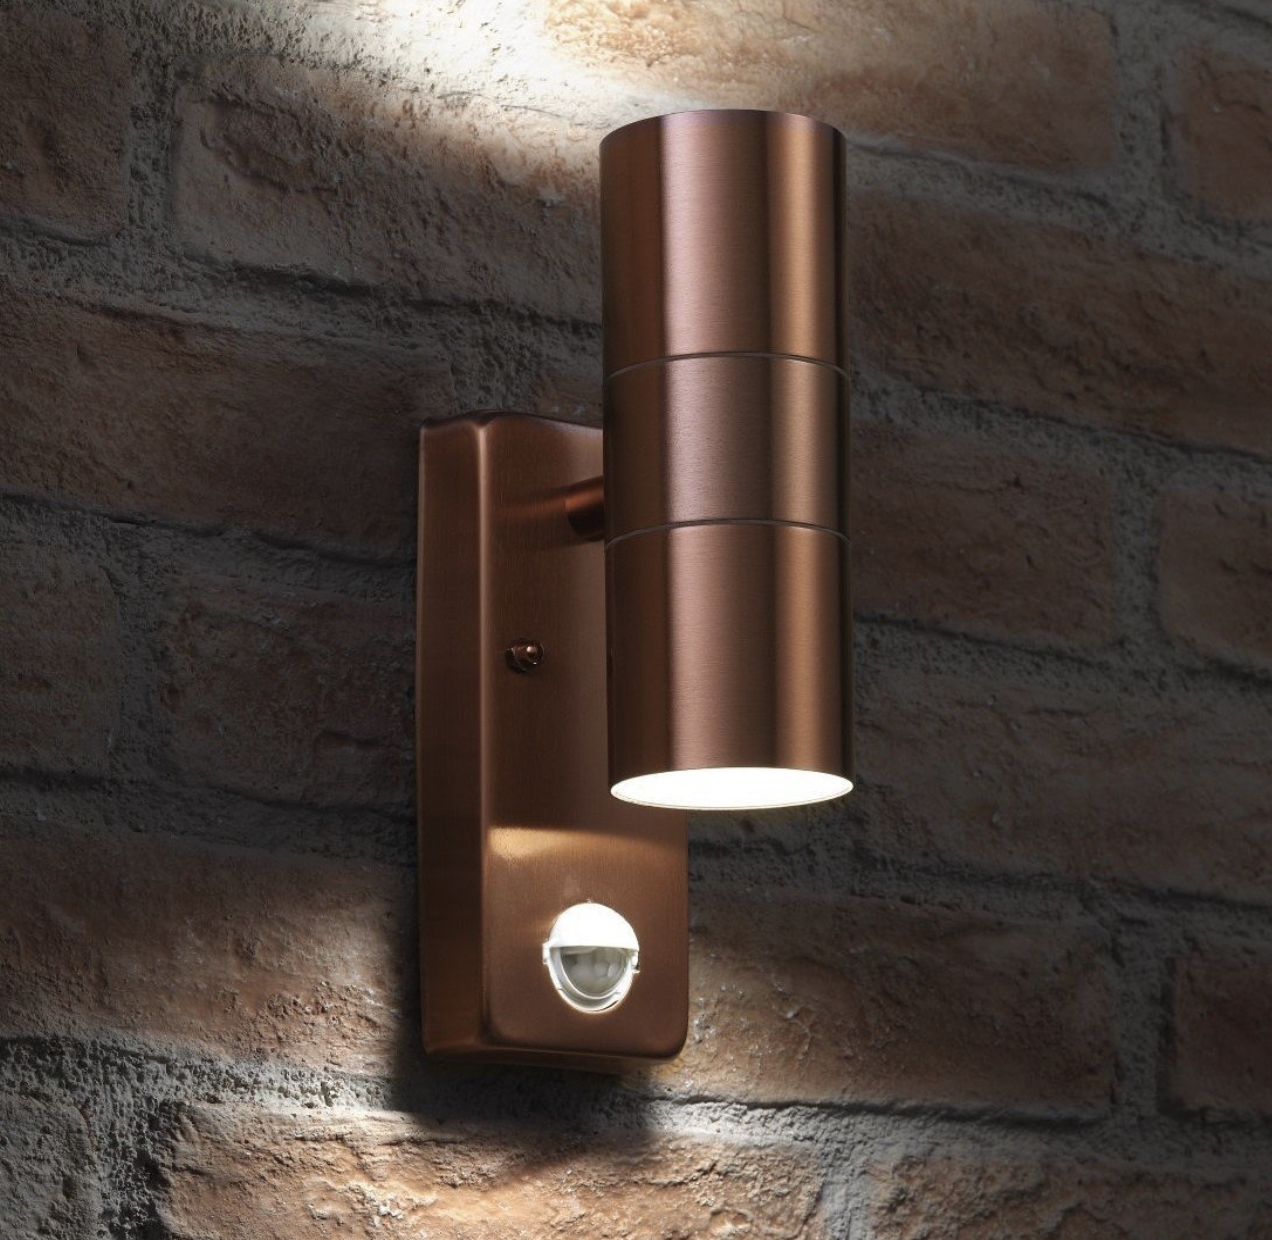 Auraglow Motion Sensor Up Down Outdoor Wall Light Copper Sensor Lights Outdoor Outdoor Wall Lantern Motion Sensor Lights Outdoor